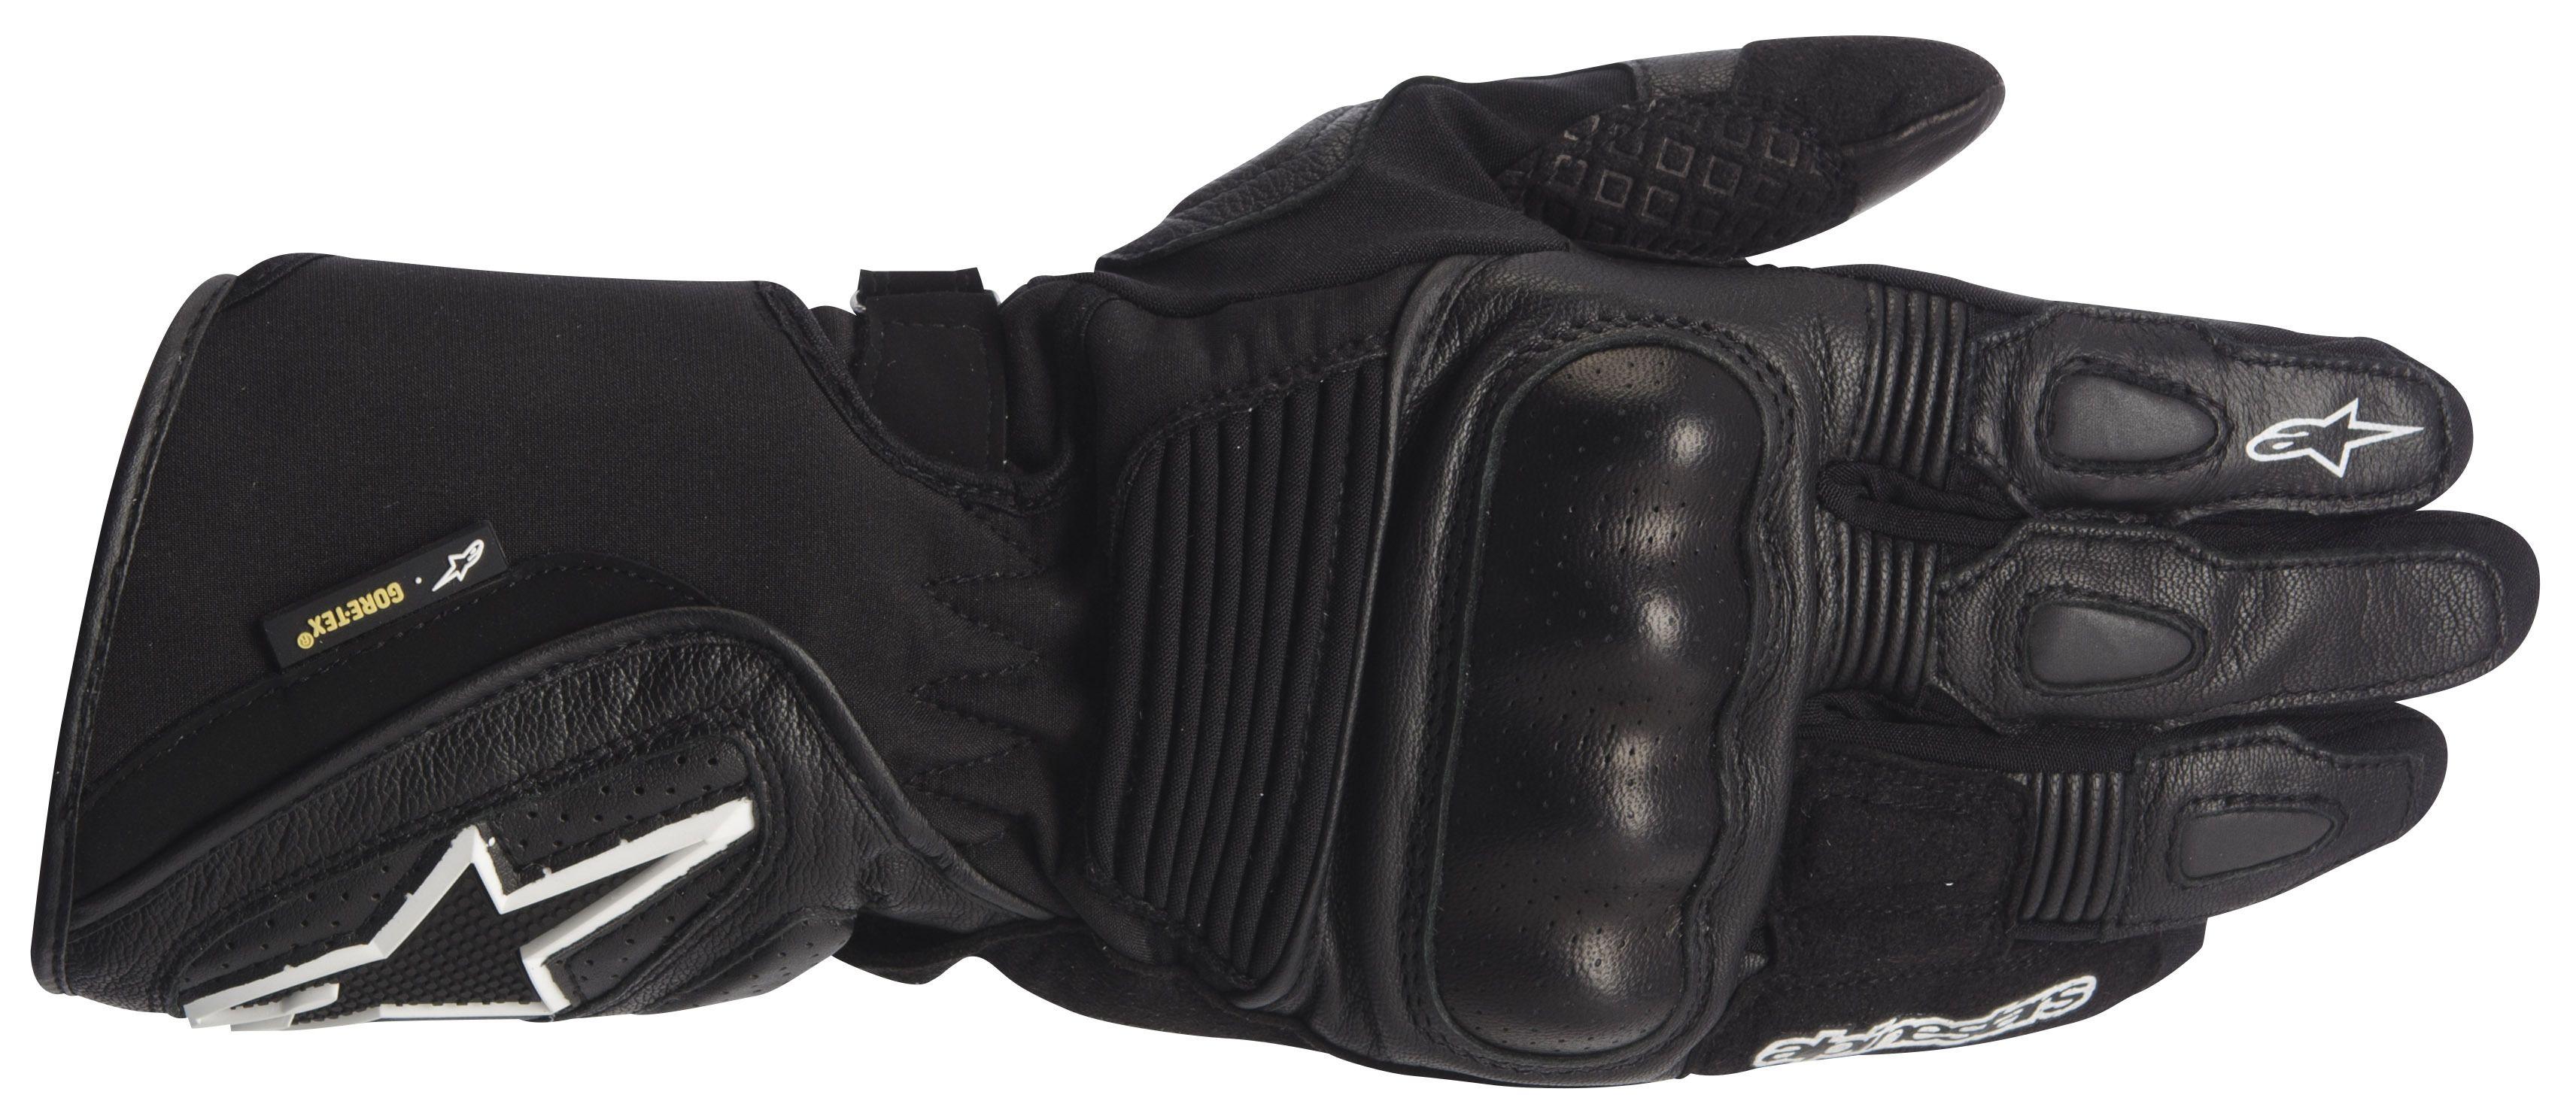 Xtrafit motorcycle gloves - Xtrafit Motorcycle Gloves 6